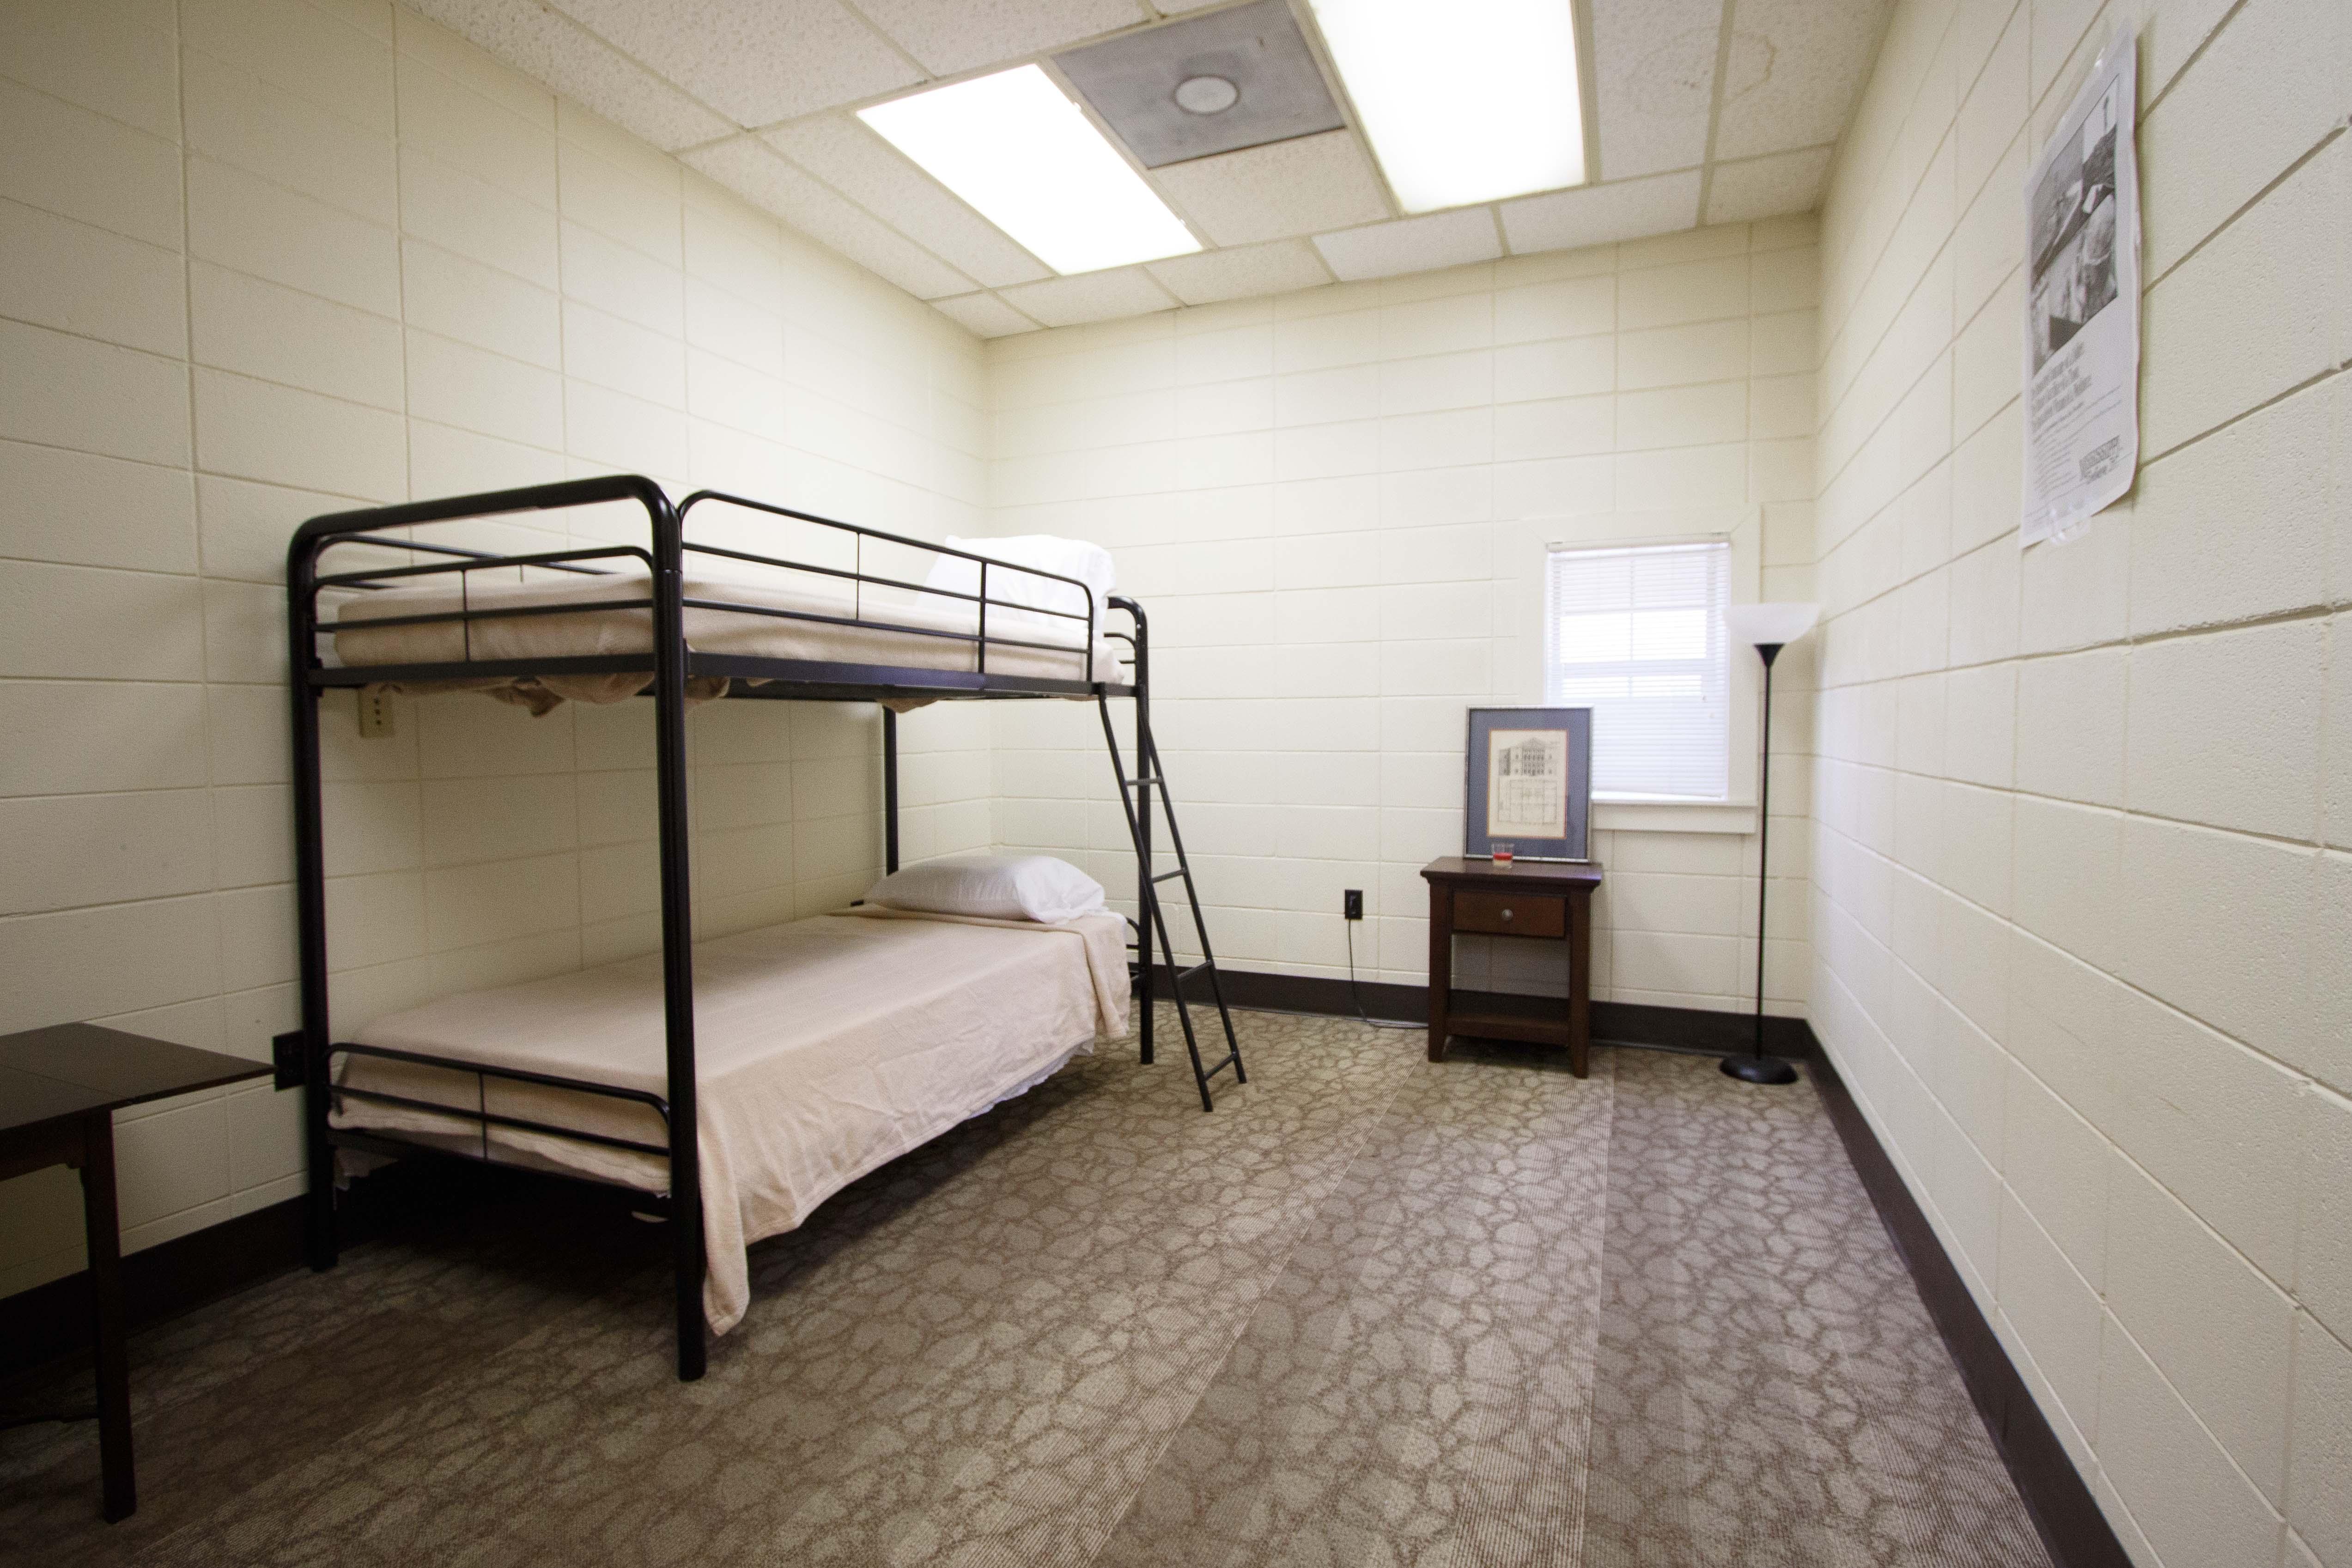 Hostel-16